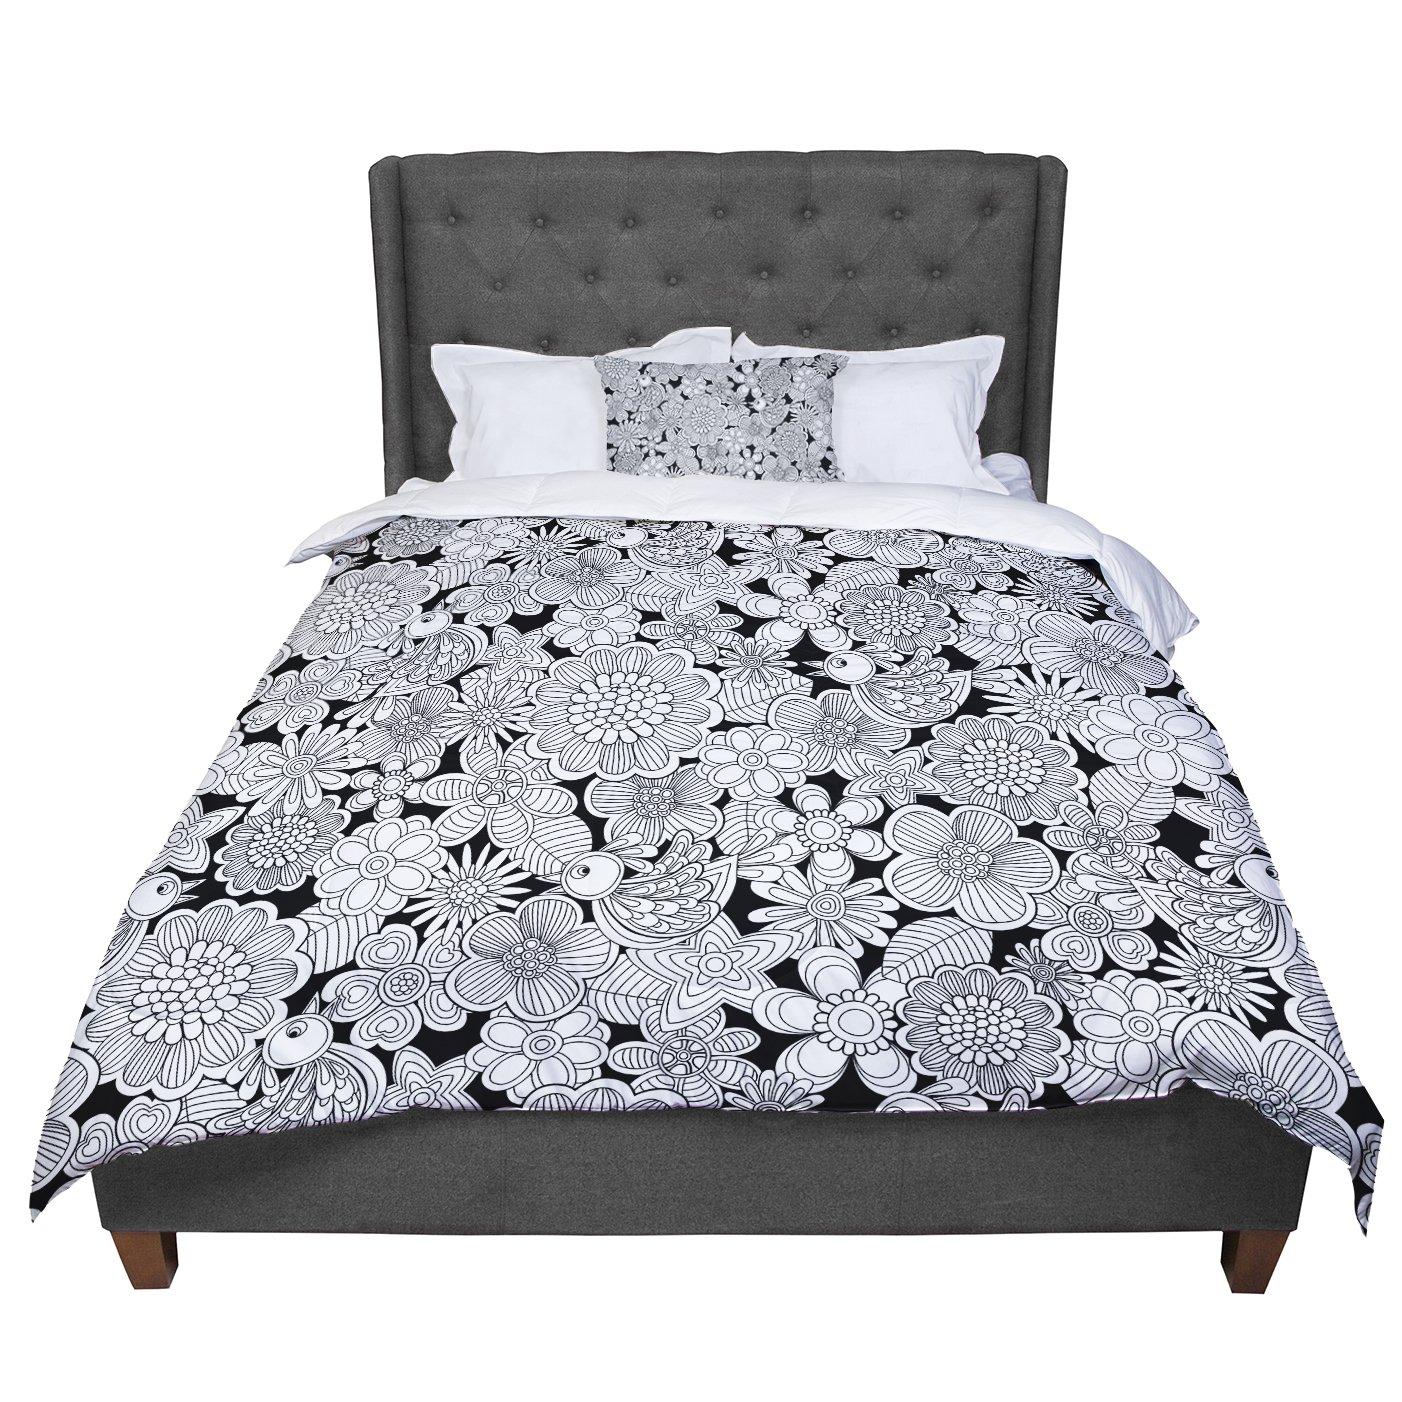 KESS InHouse Julia Grifol Welcome White Birds Black Floral Twin Comforter 68 X 88